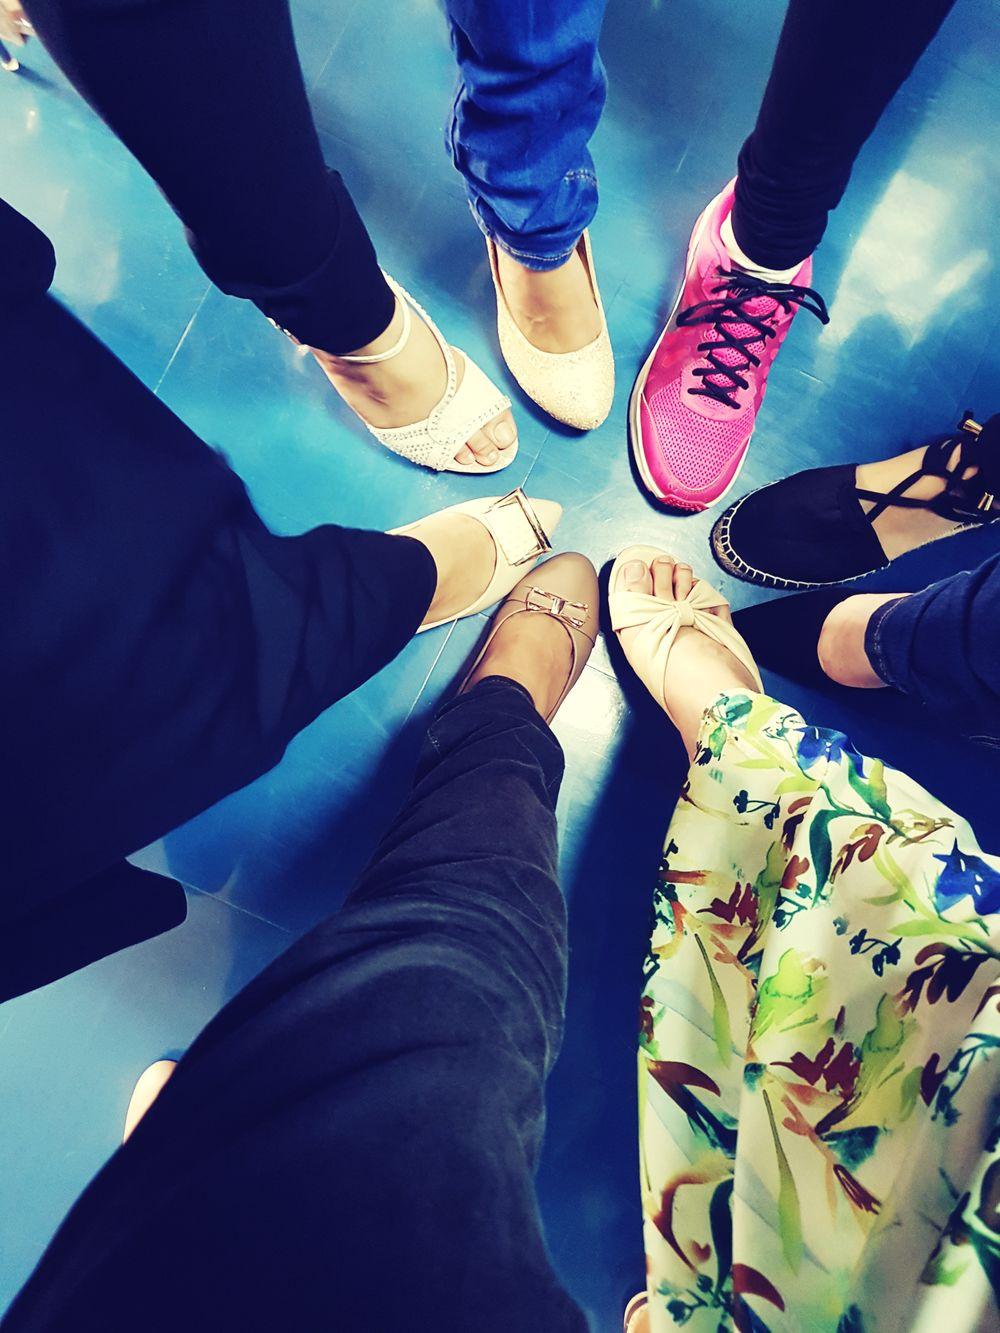 Women FRIENDSHIPGOALS Girls Girlspower Girlstuff  GirlsGeneration Sassy Shoes